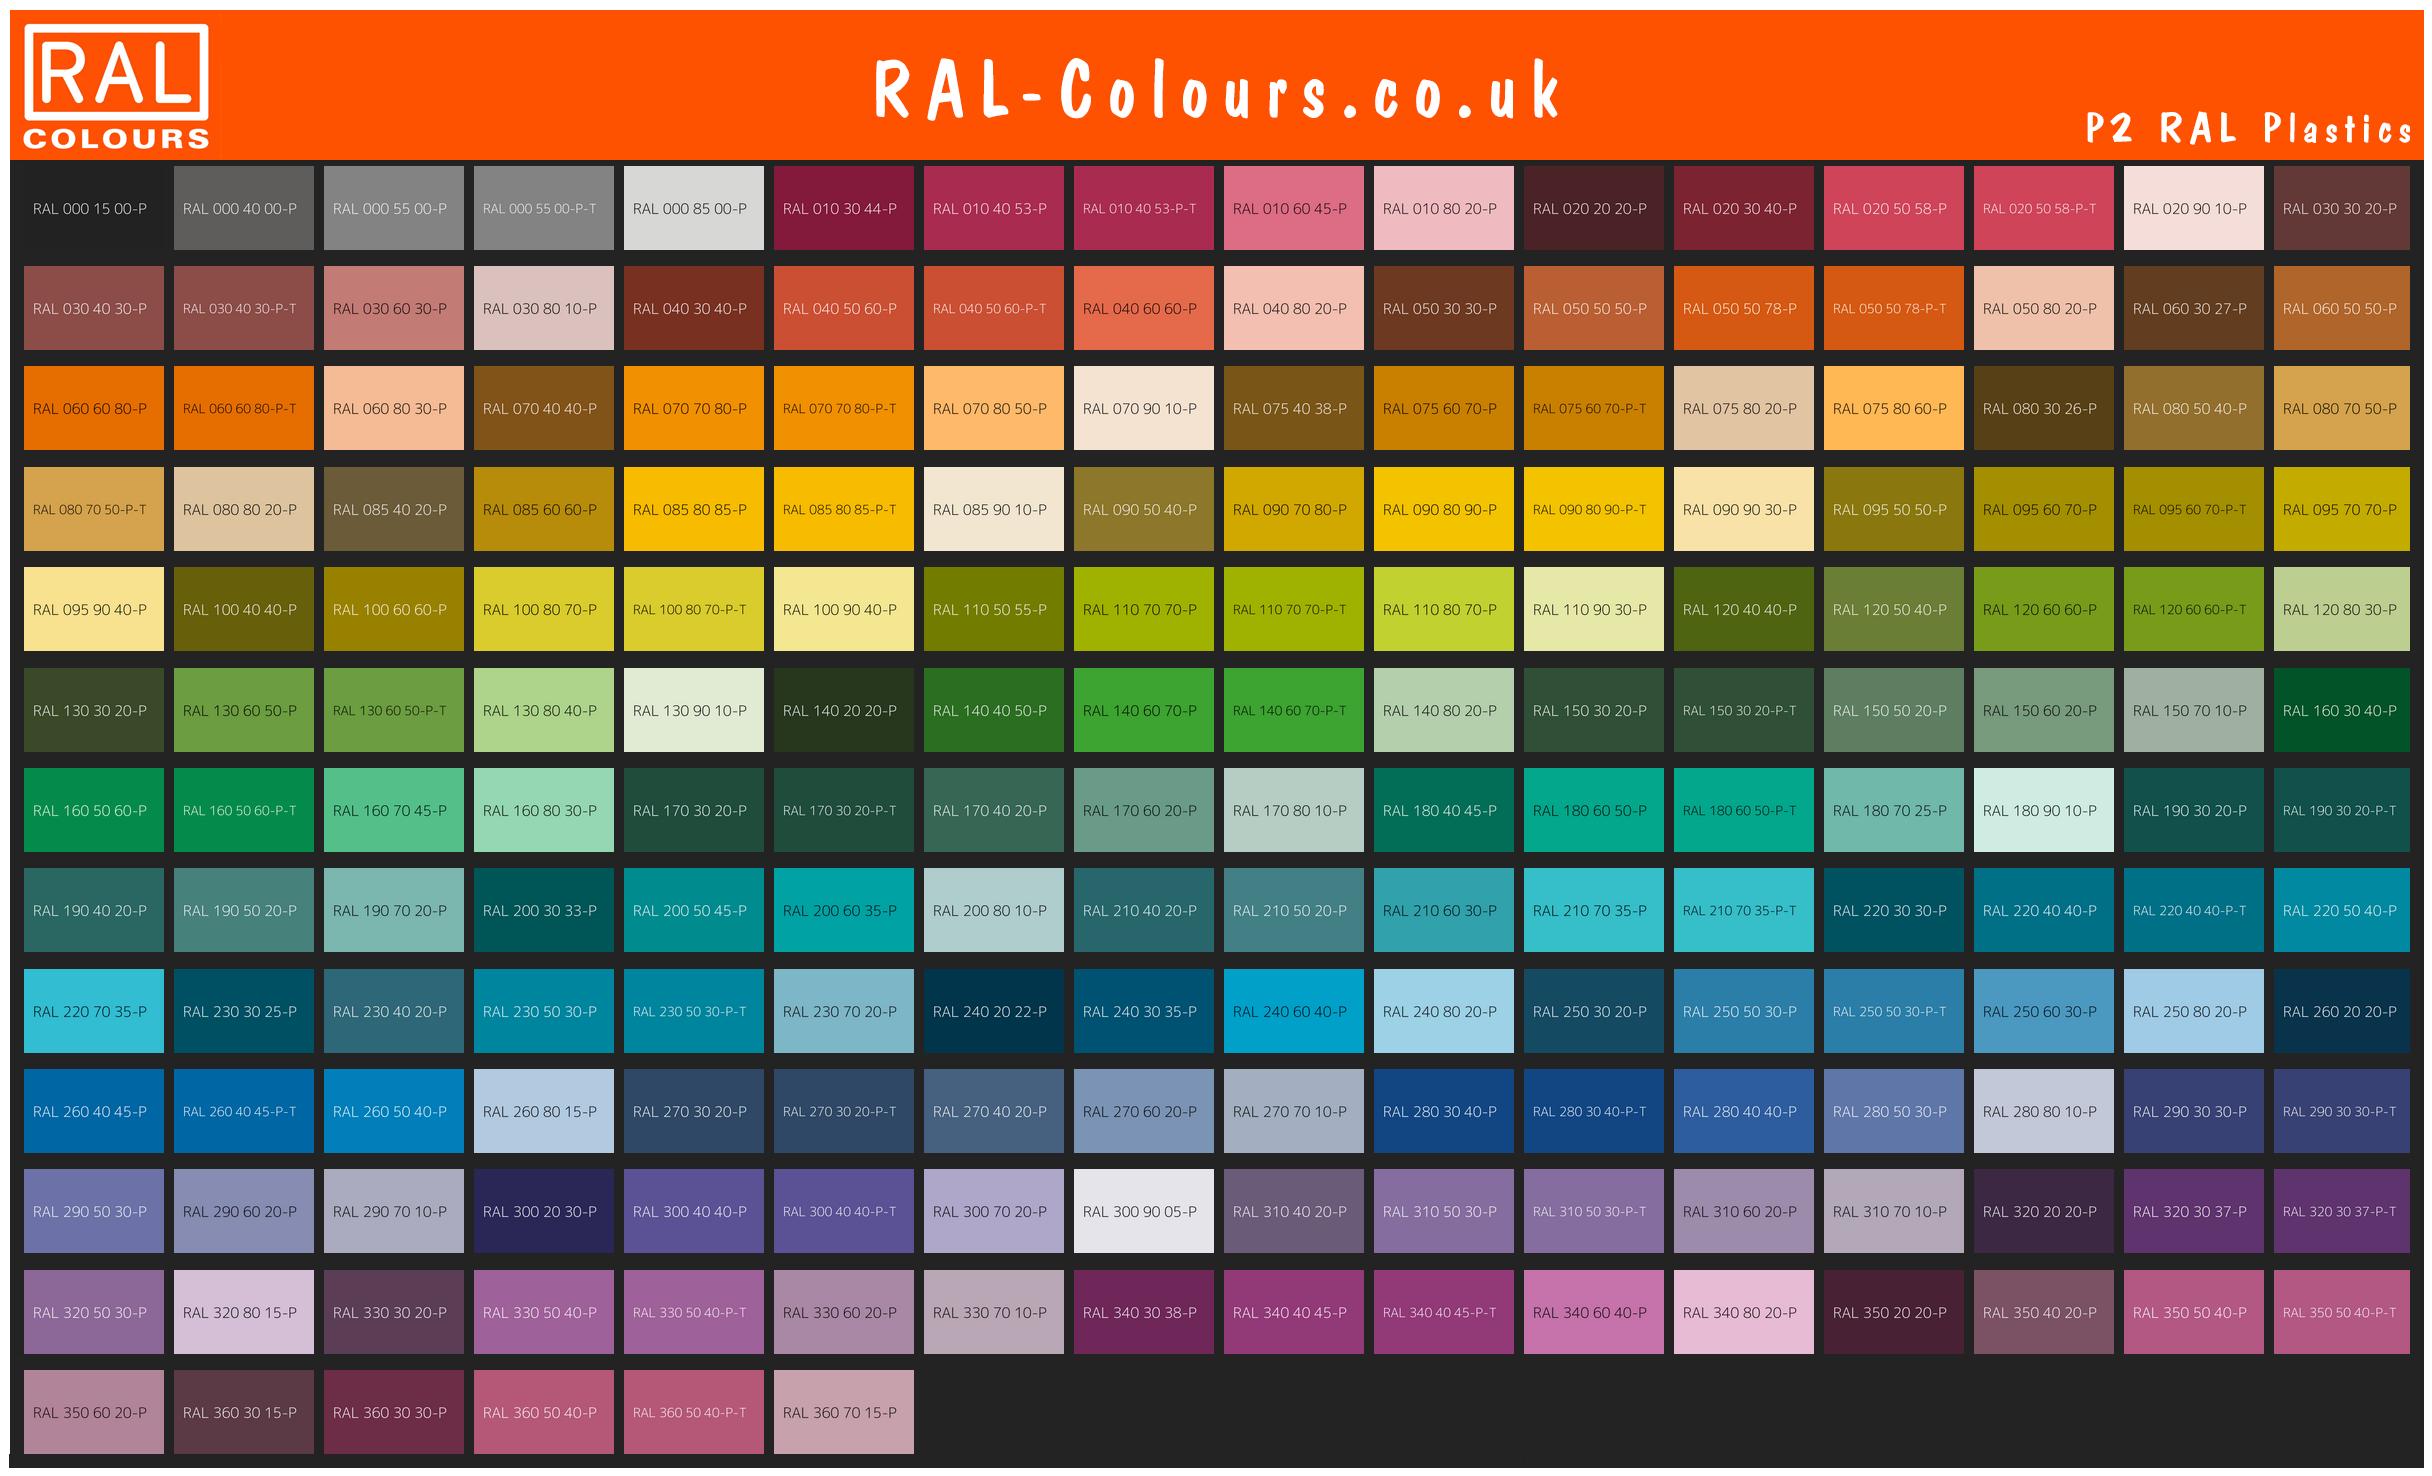 RAL Plastics P2 Colour chart